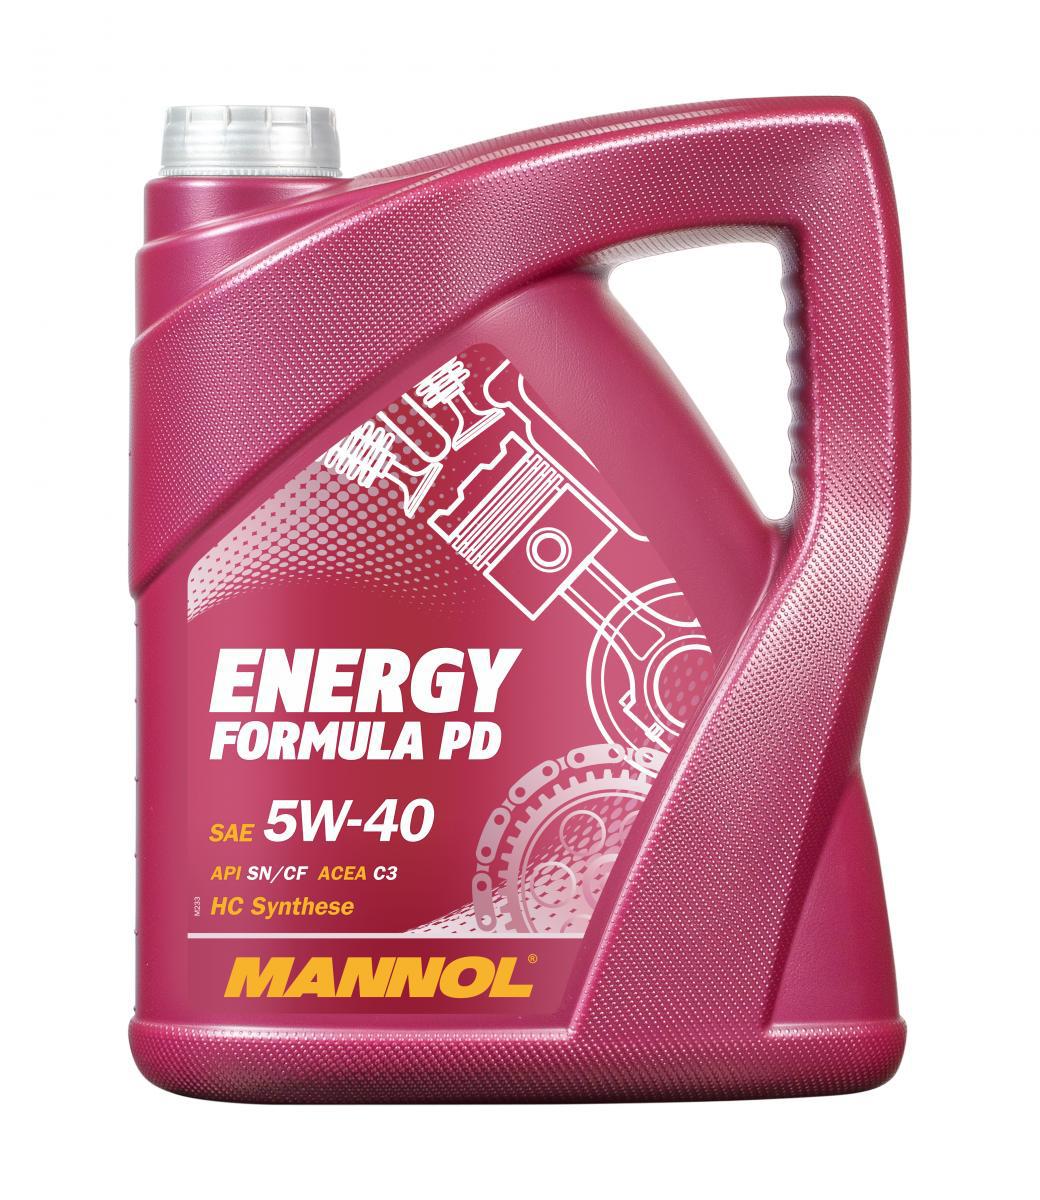 Energy Formula PD 5W-40